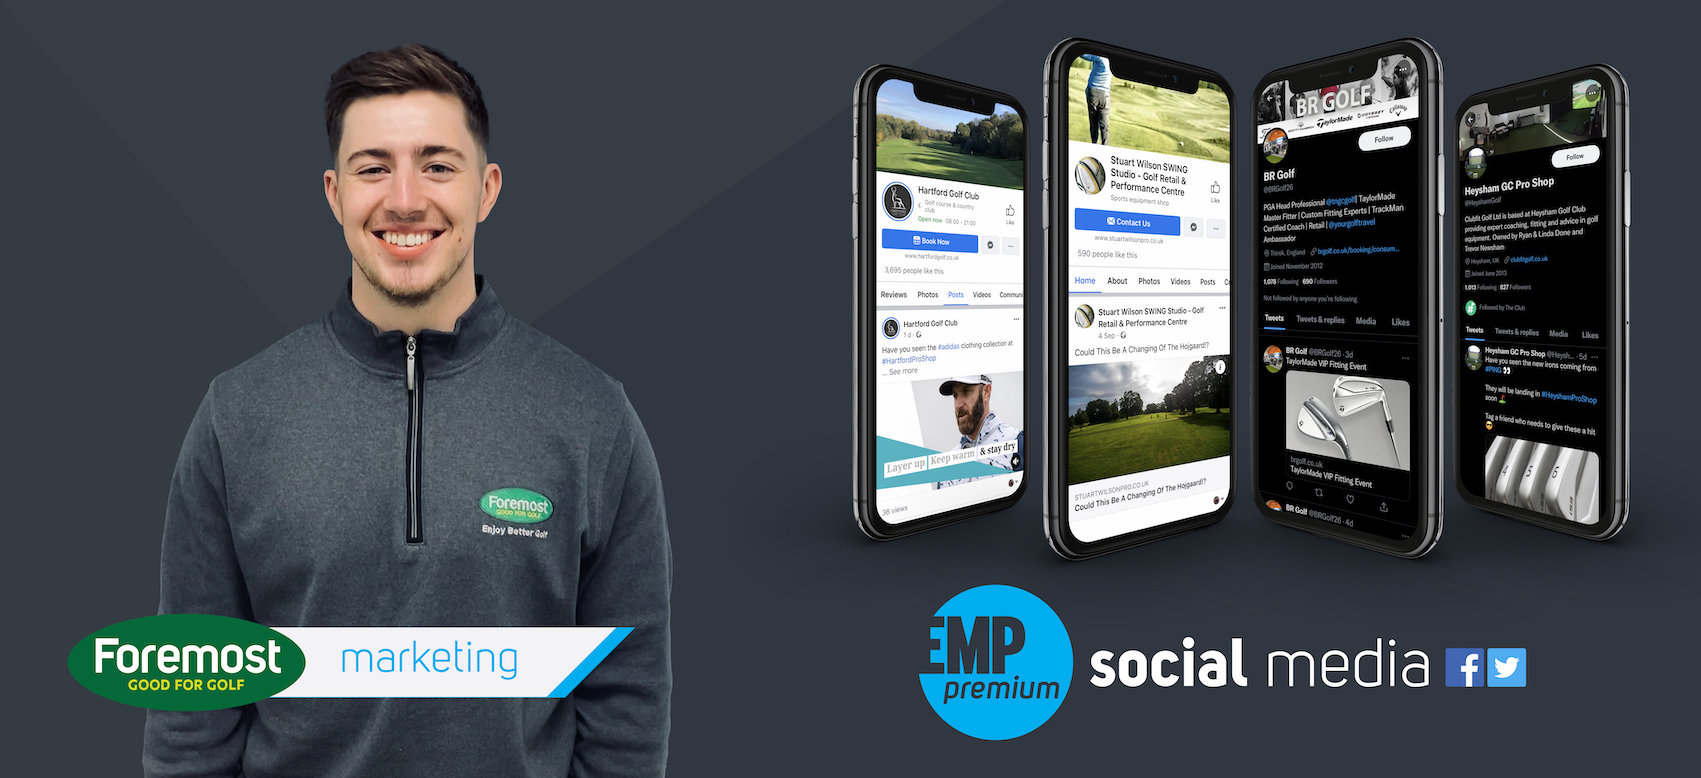 EMP-Social-Media-Manager_UPDATED